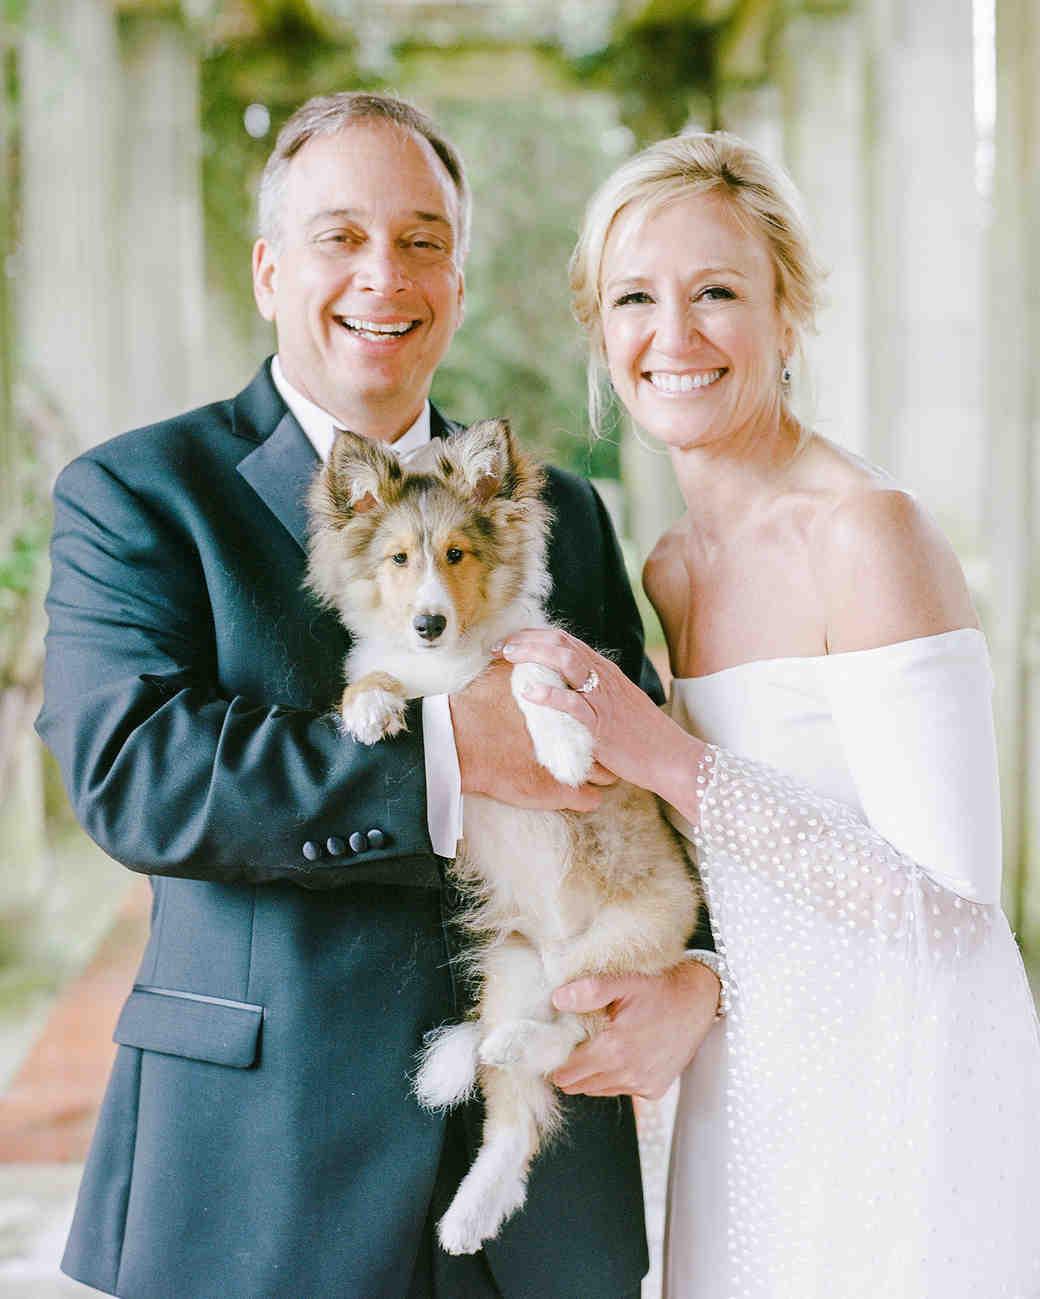 michelle robert wedding couple dog